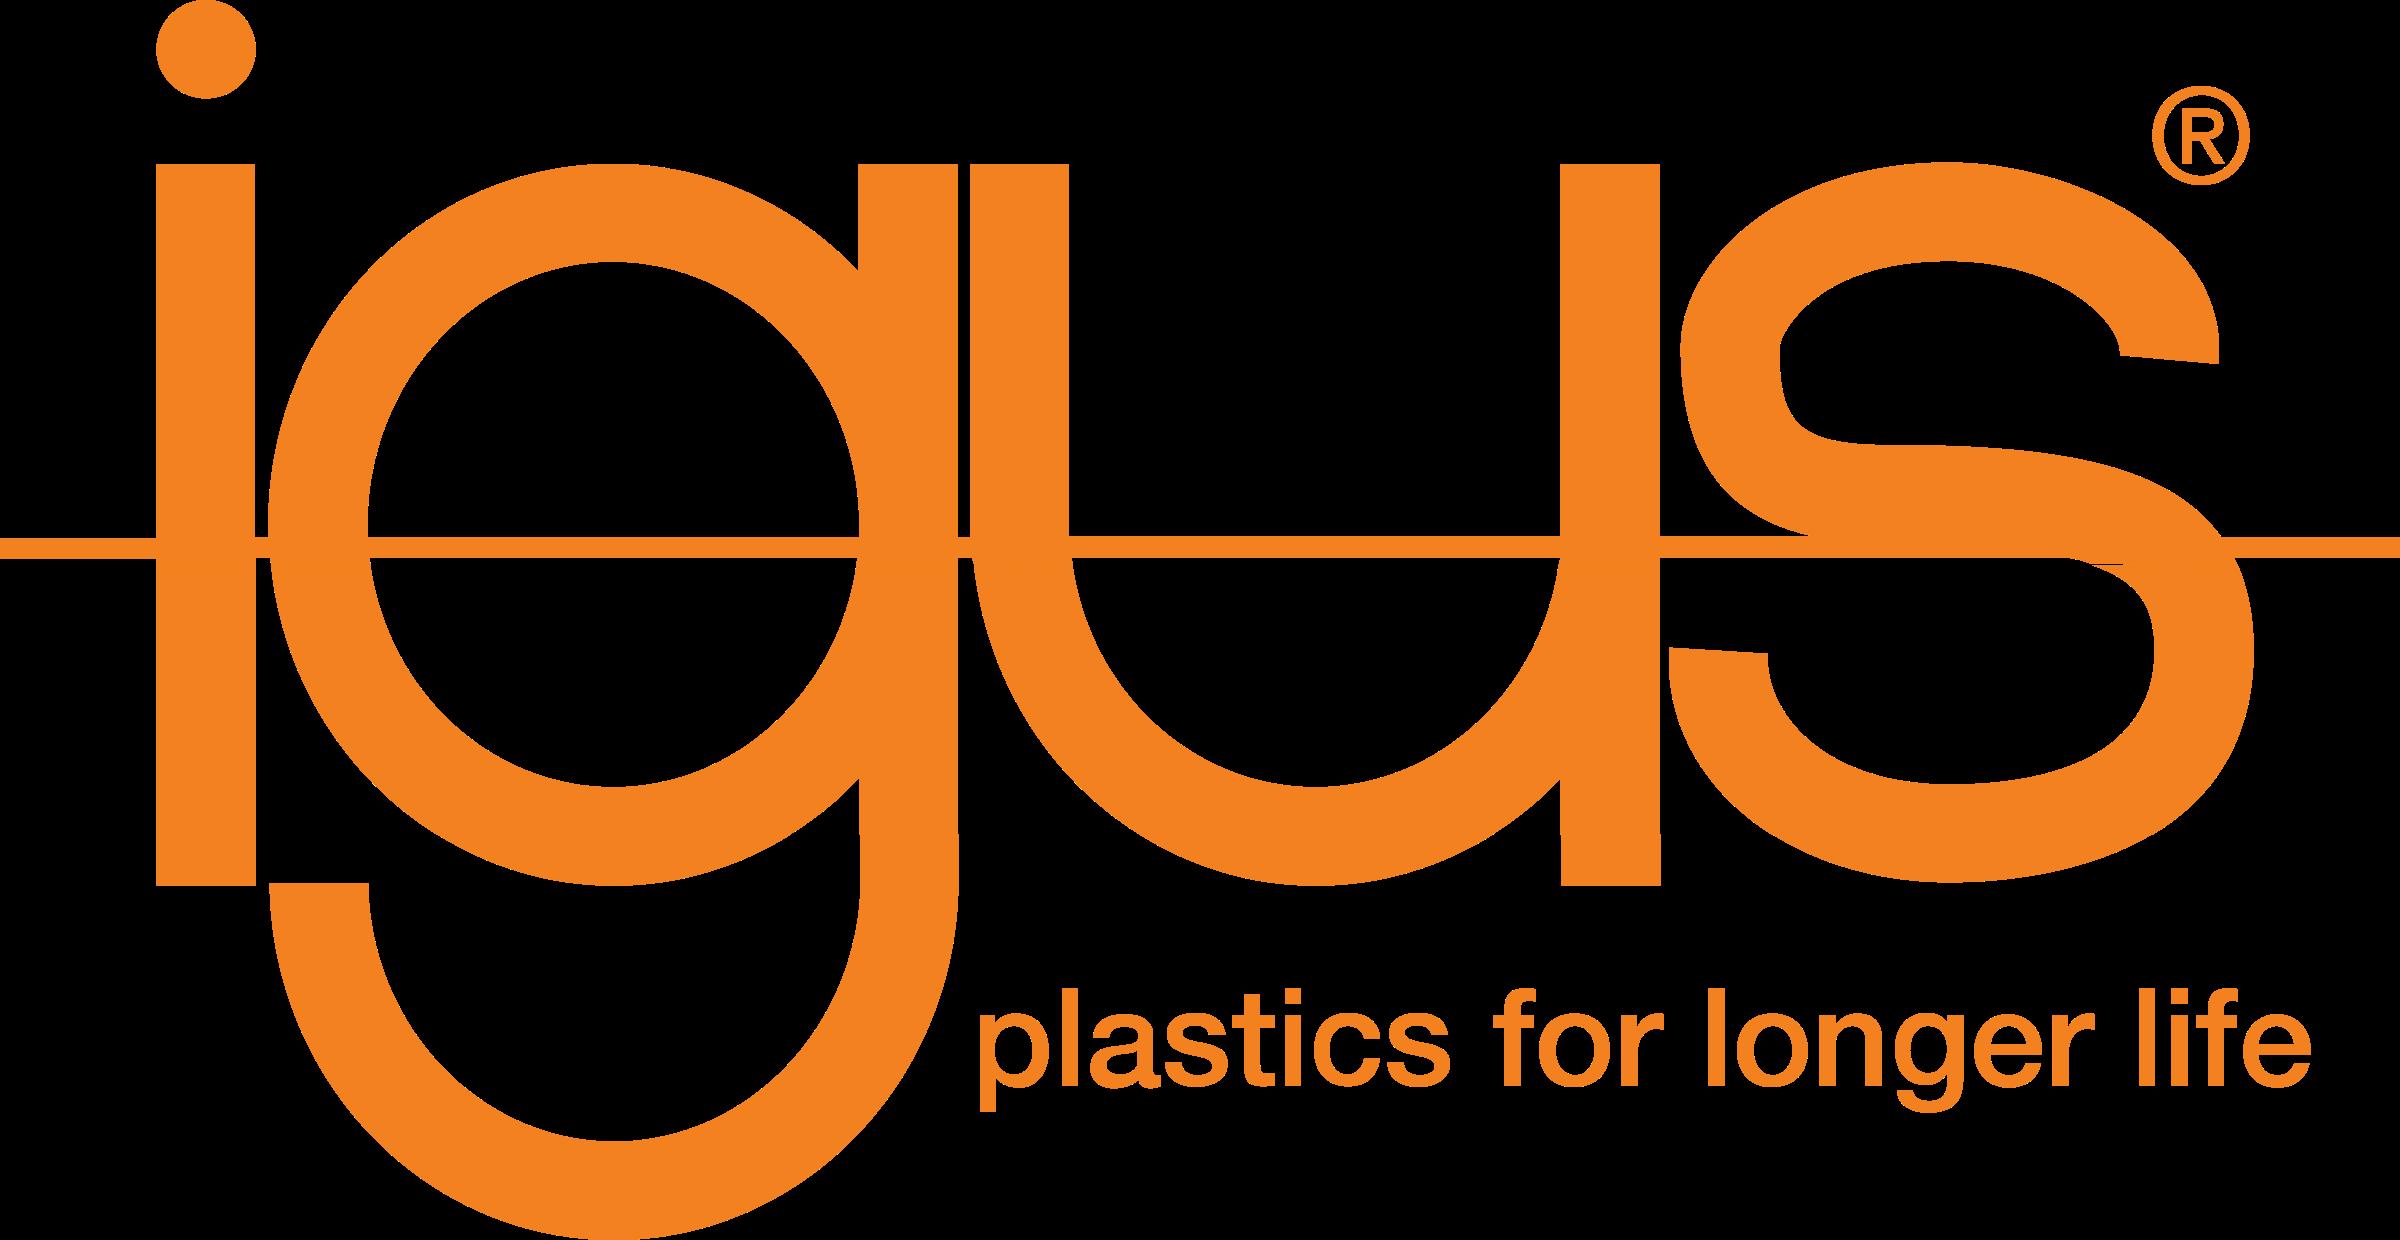 igus-logo-png-transparent.png